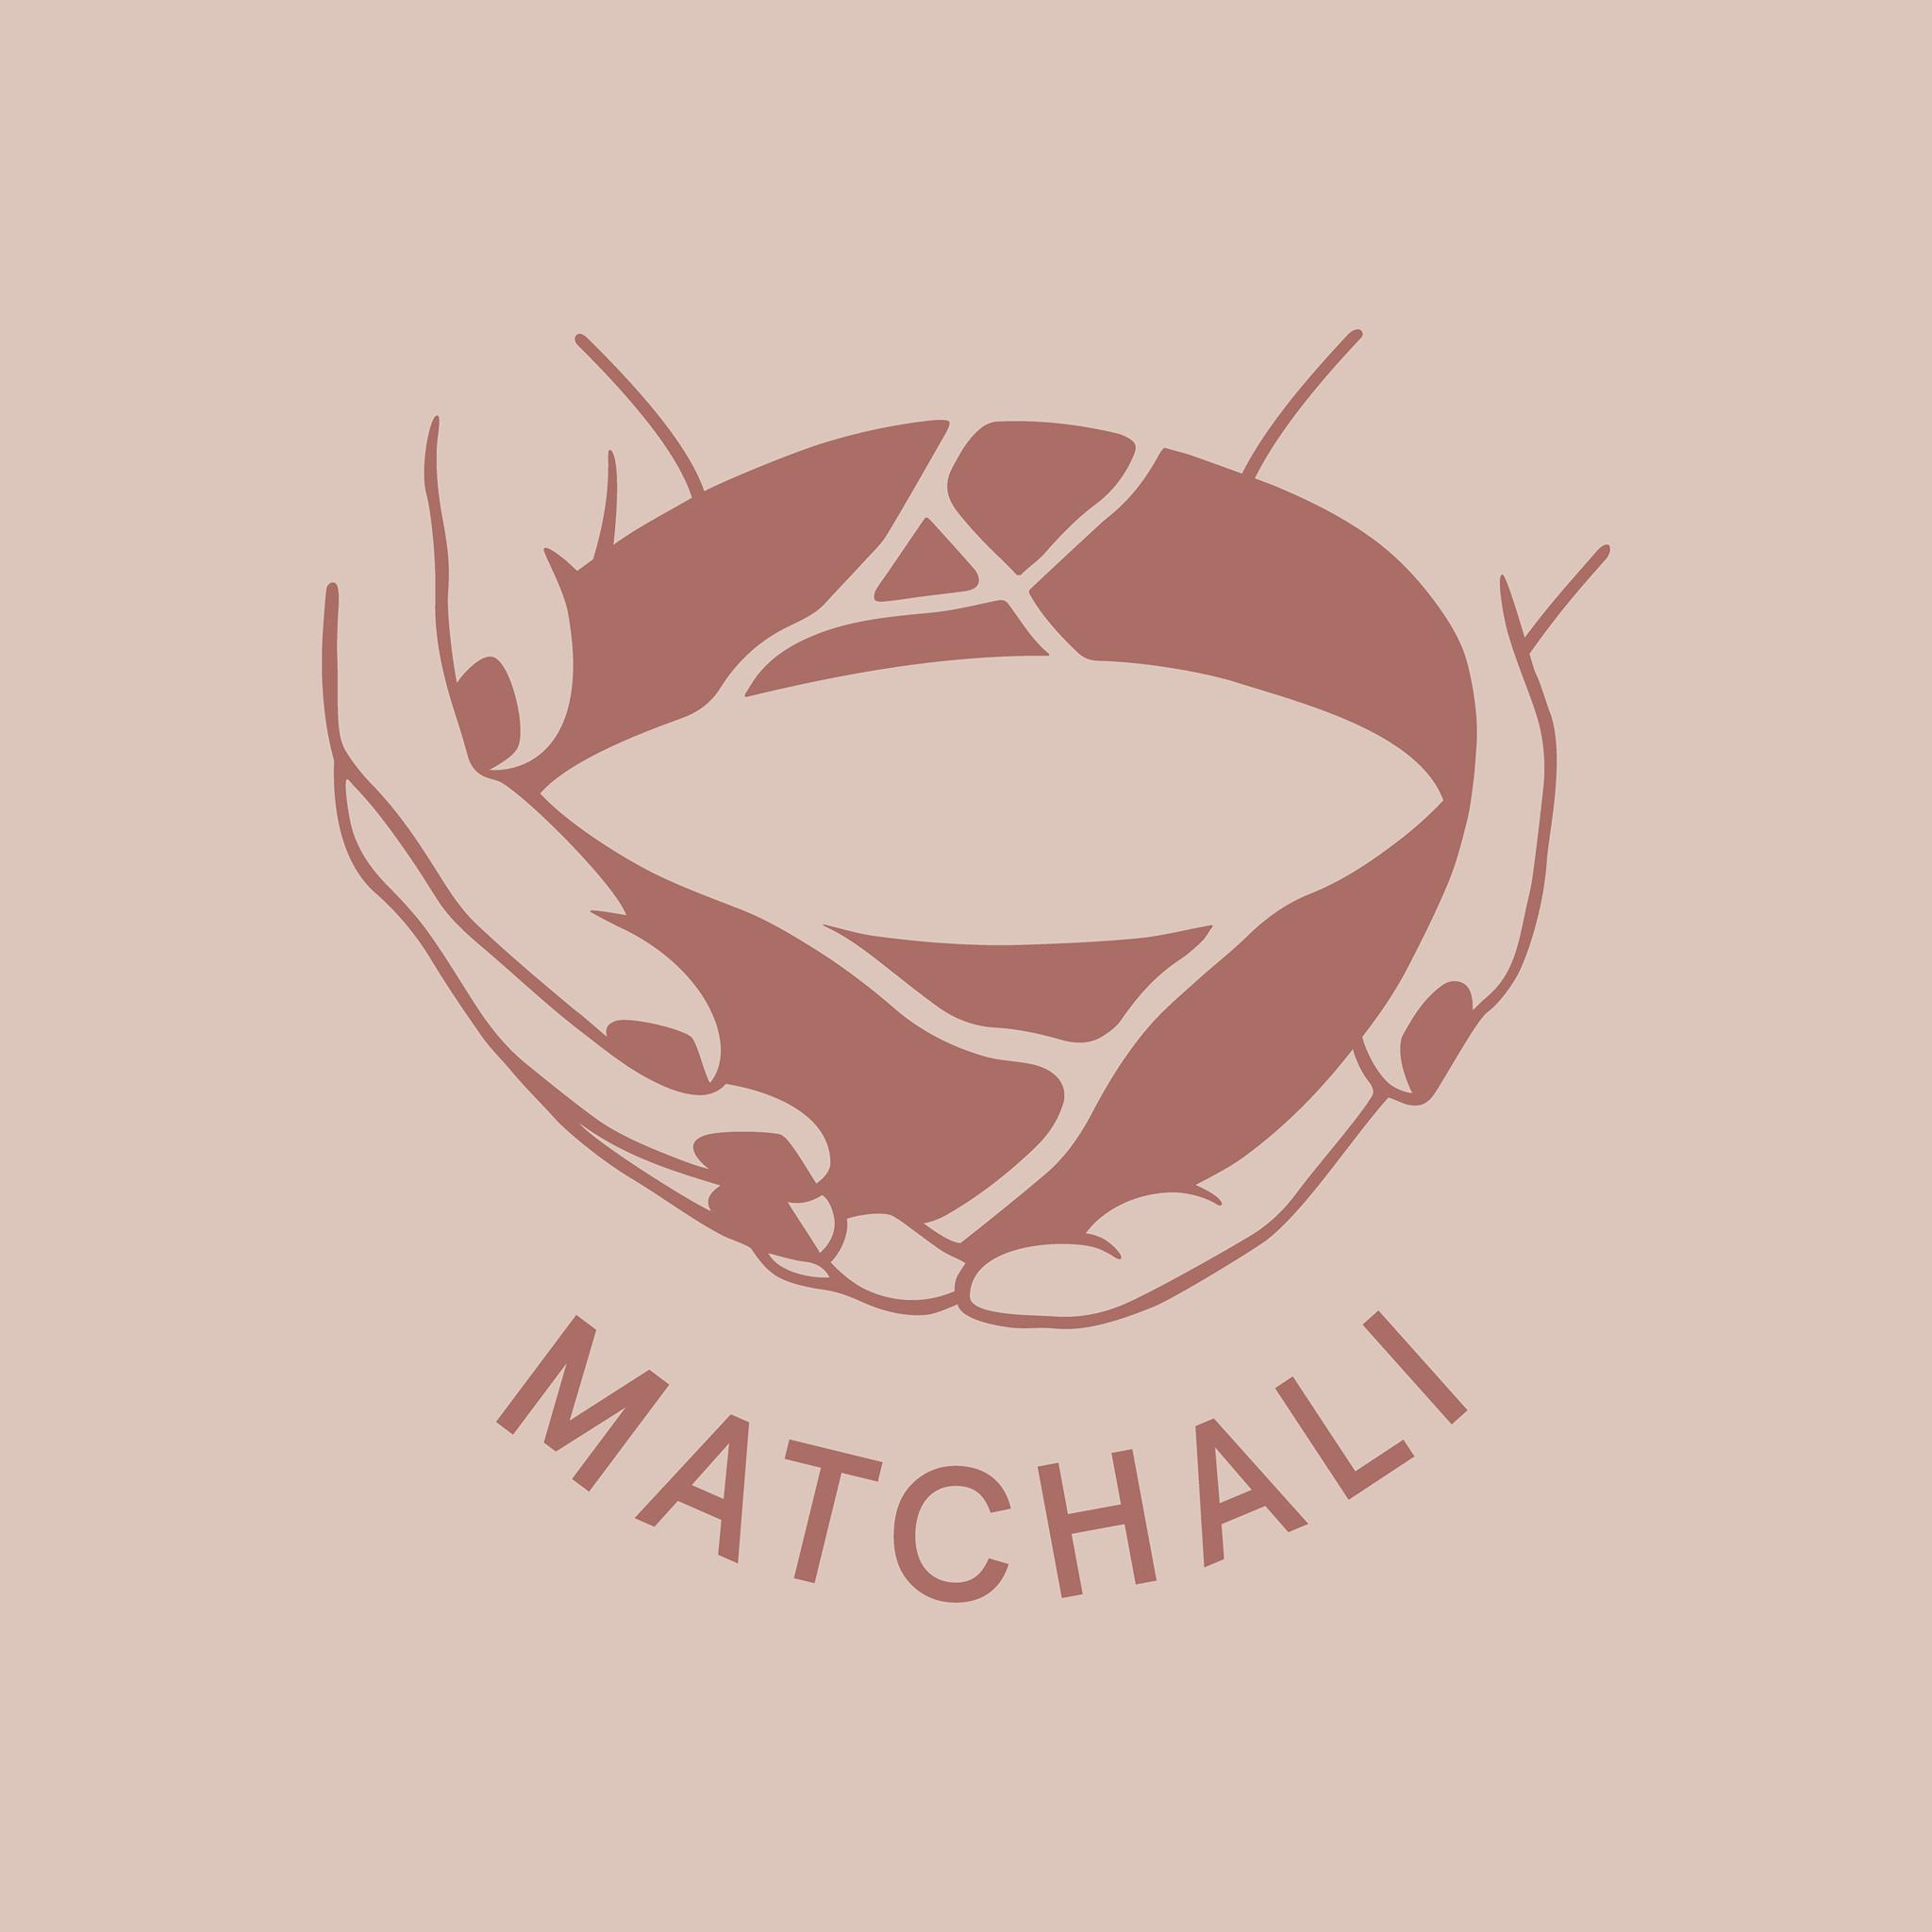 Matchali